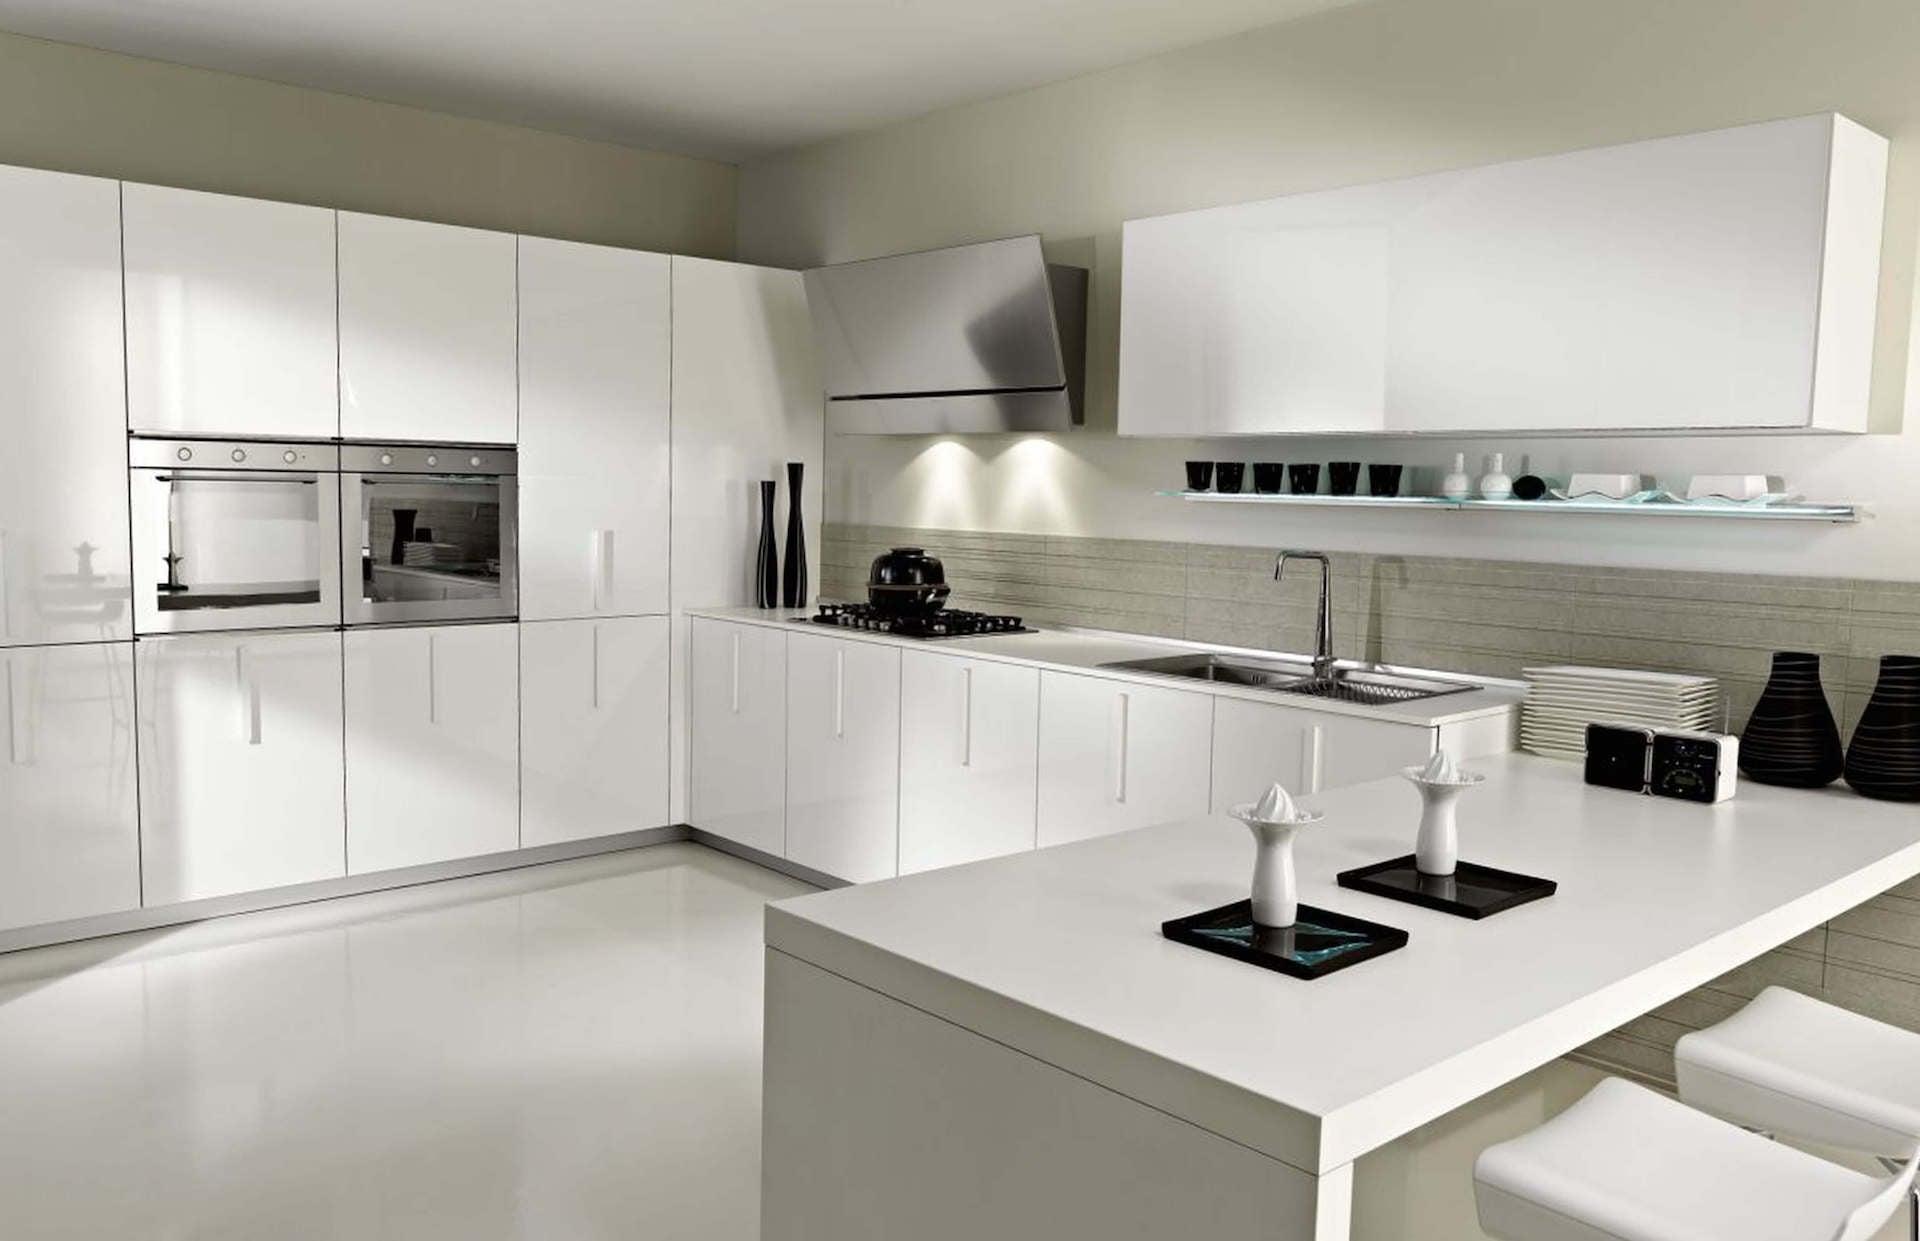 white-Ikea-Modern-Kitchen-Design-Ideas-with-Foxy-Ikea-Kitchen-Design-and-cabinets-faucets-stainless-backsplash-oven-and-mid-century-modern-kitchen-design-ideas.jpg